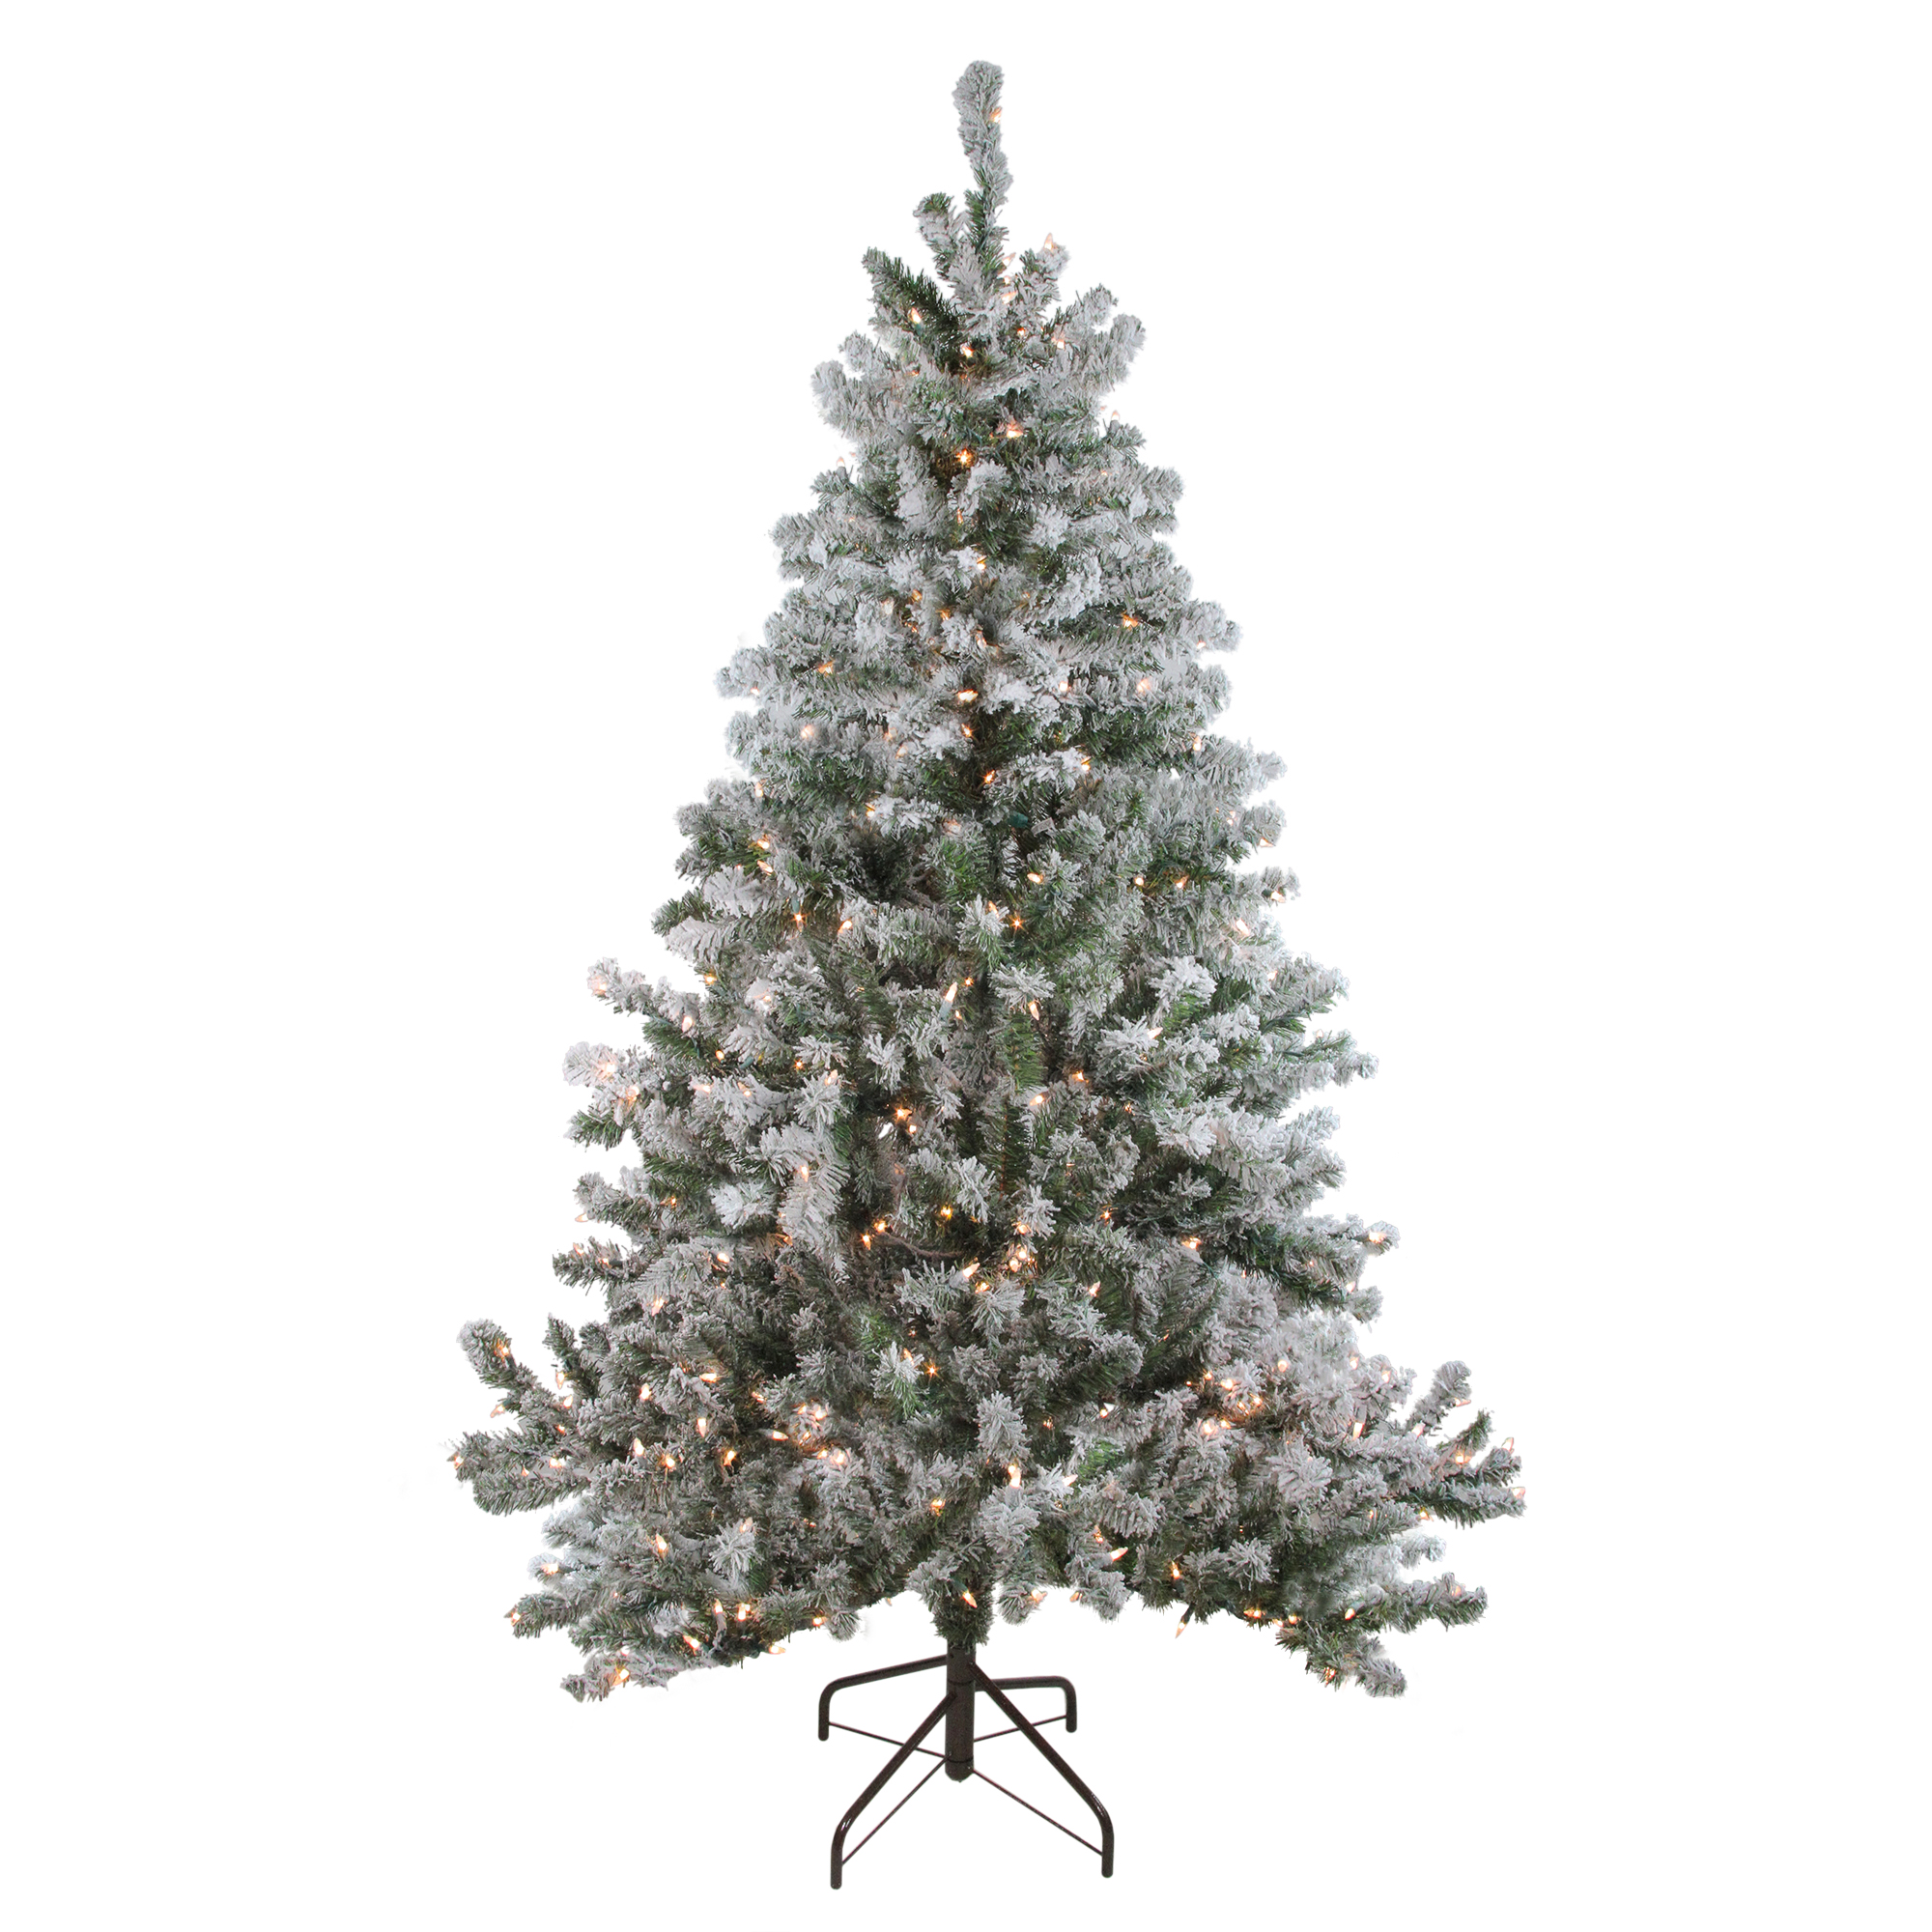 Pre Lit Flocked Artificial Christmas Trees: 7' Pre-Lit Flocked Balsam Pine Artificial Christmas Tree